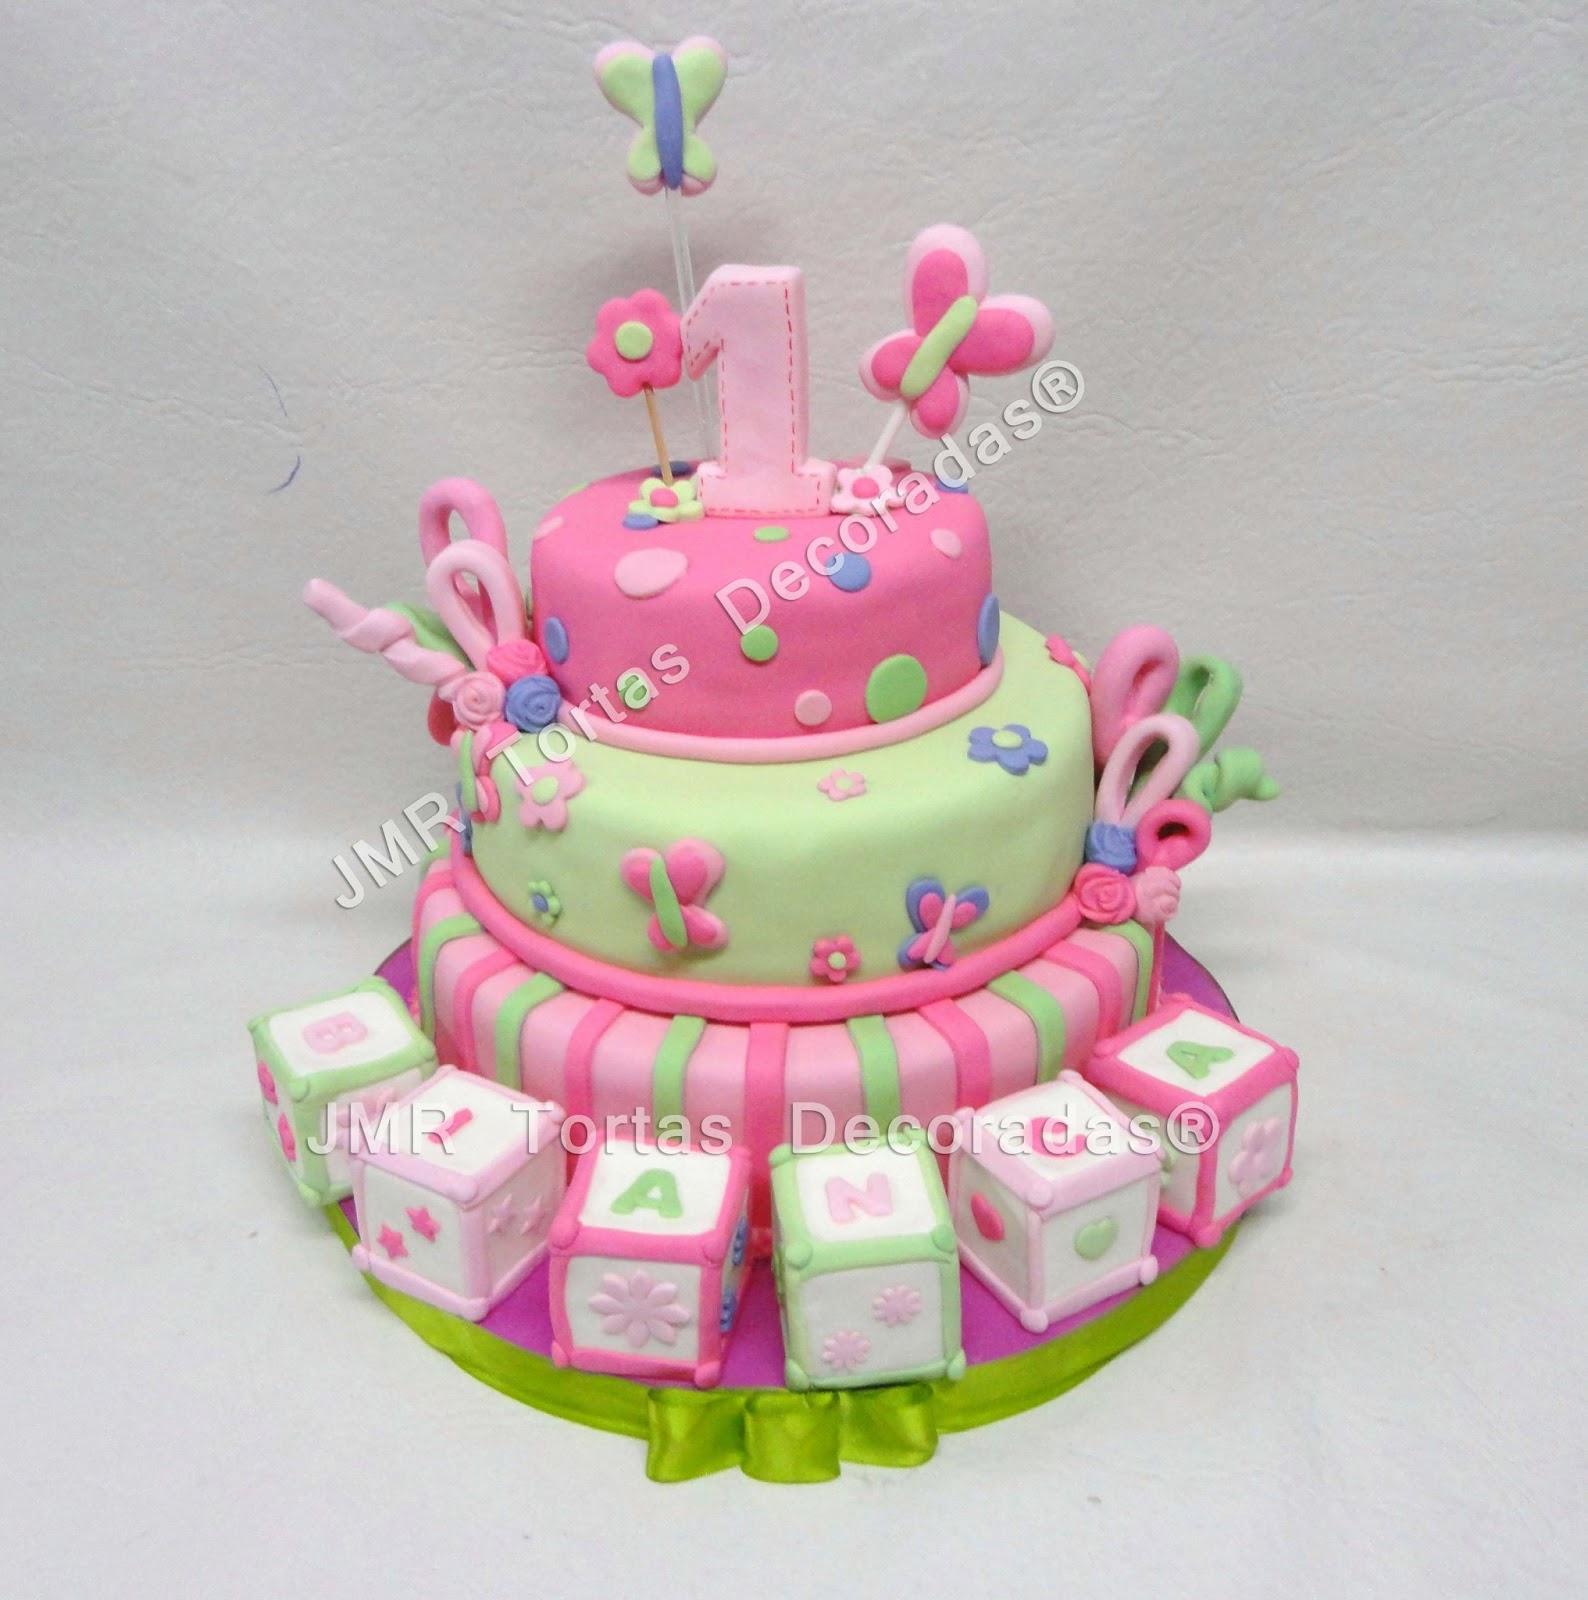 Torta Cubos para el primer añito de Bianca | JMR Tortas Decoradas